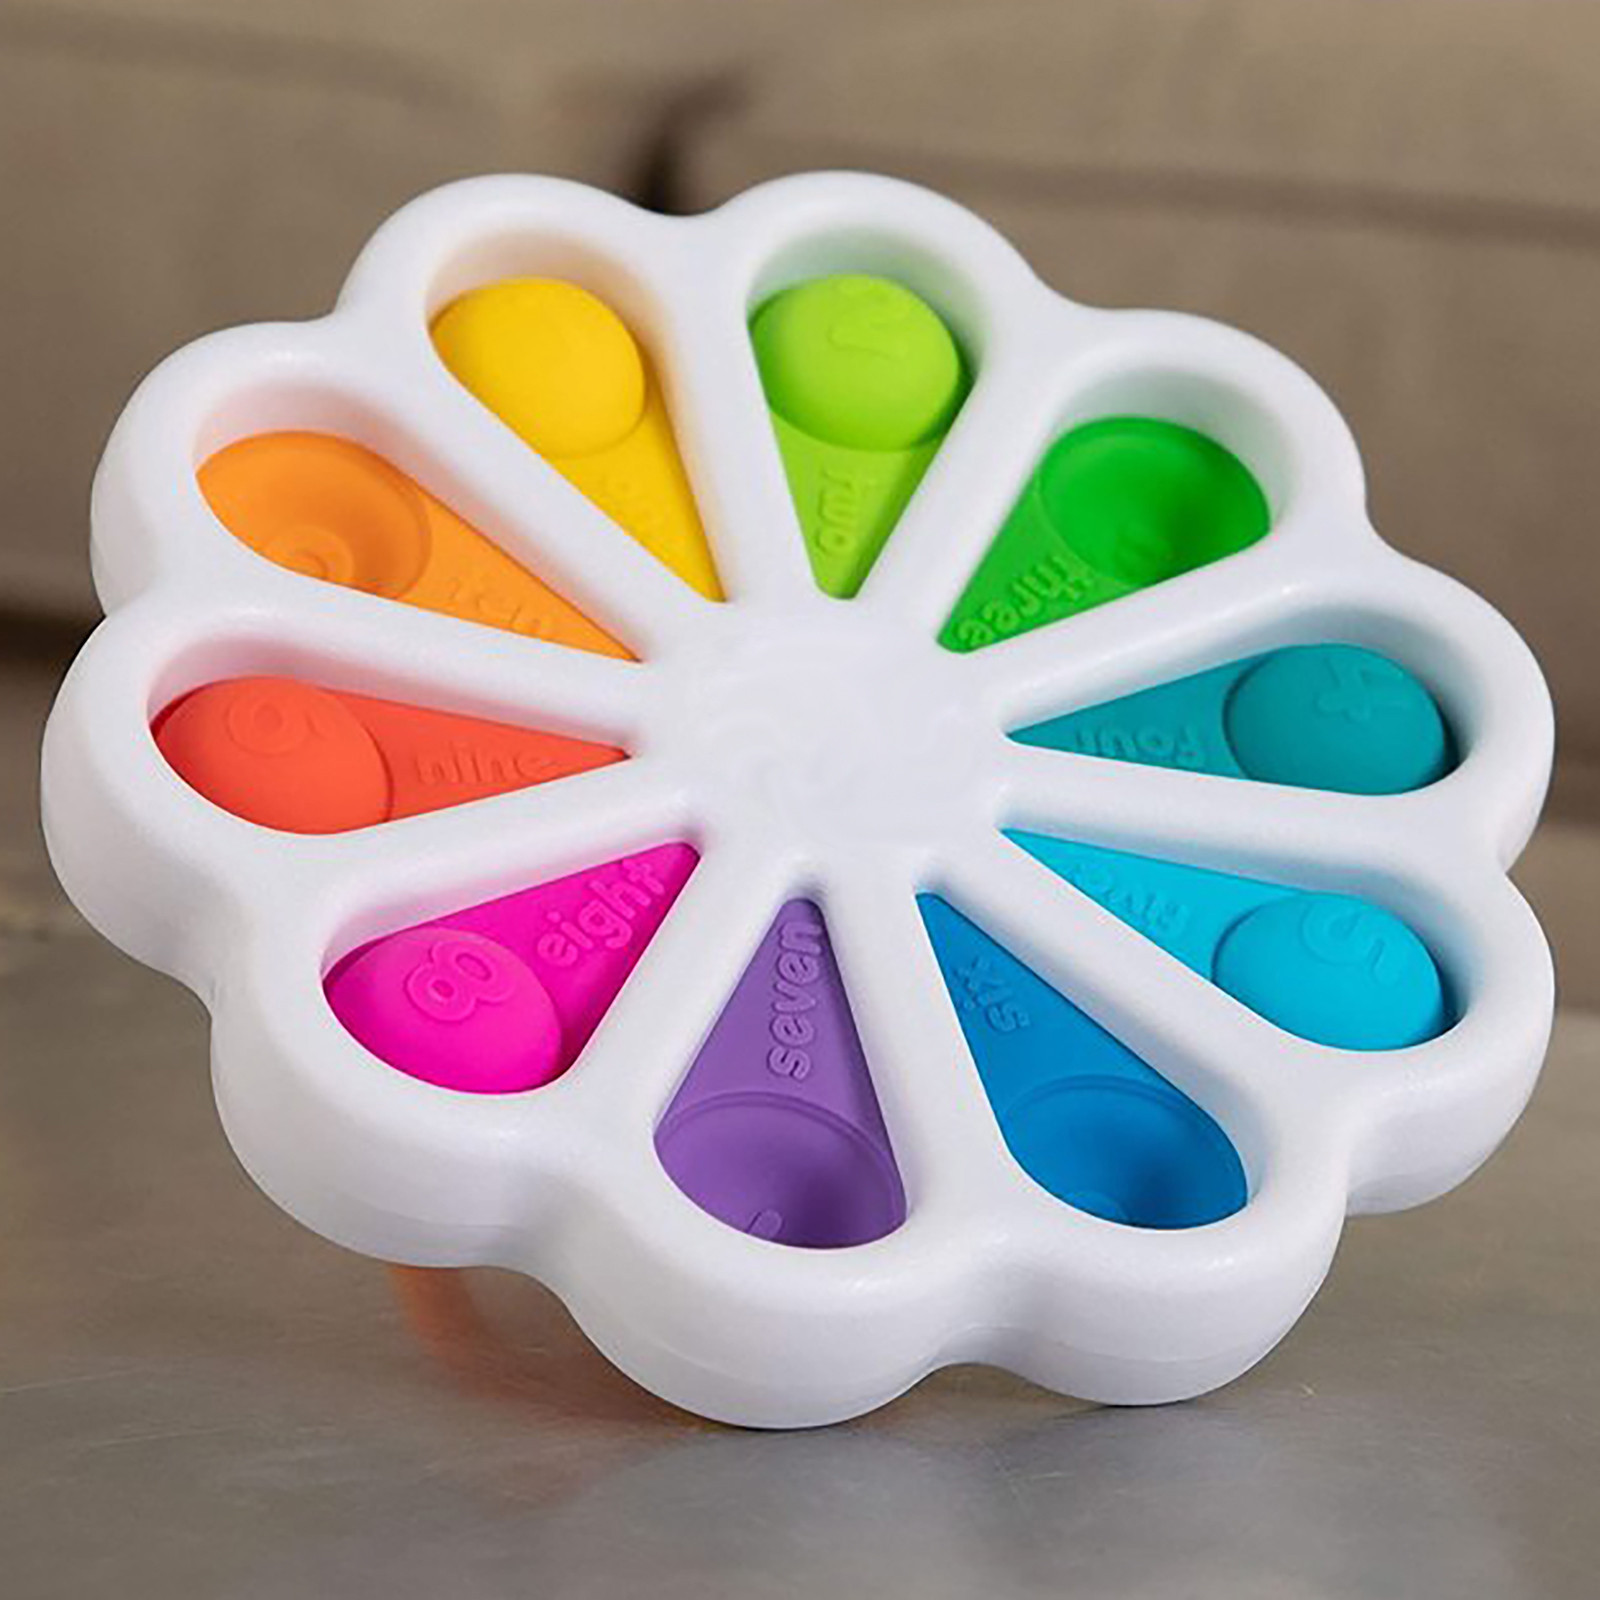 Toy Adult Bubble-Sensory-Toy Autism Pop Fidget Anti-Stress Squishy -Push Needs Funny img5